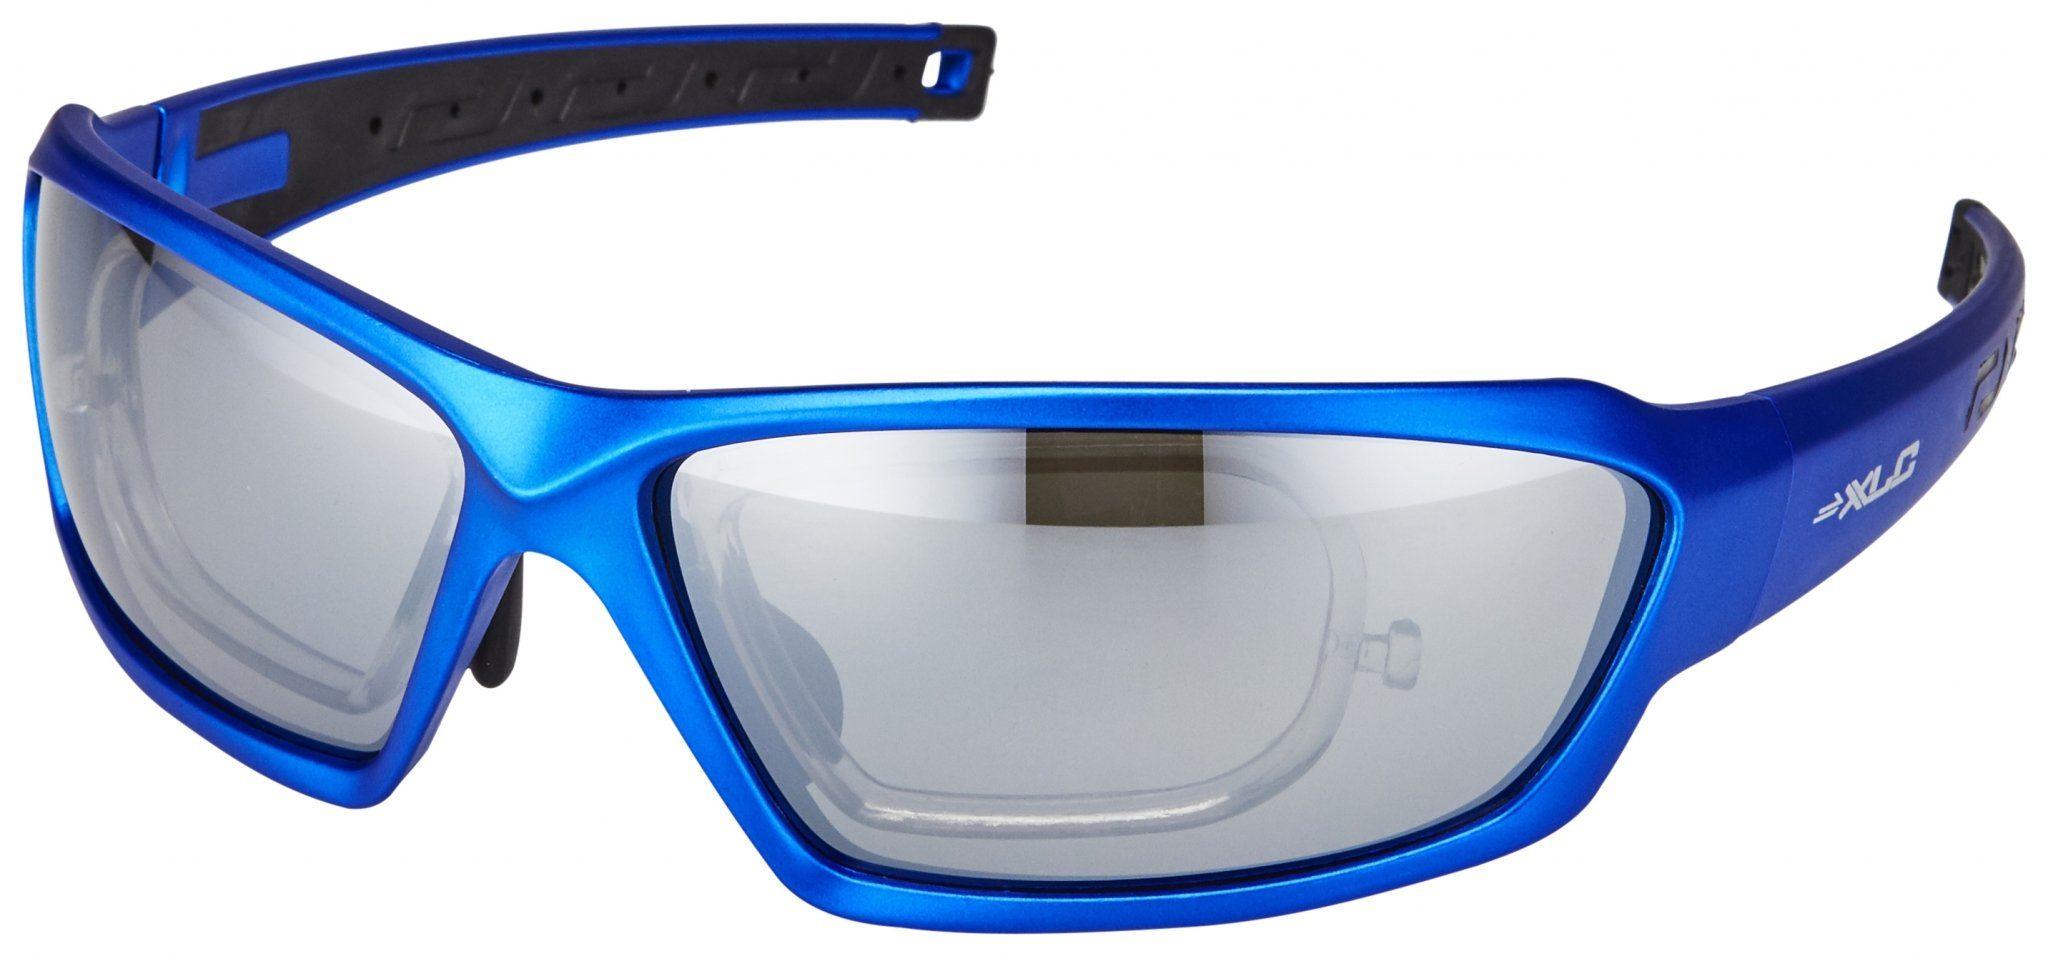 XLC Radsportbrille »Curacao Sonnenbrille«